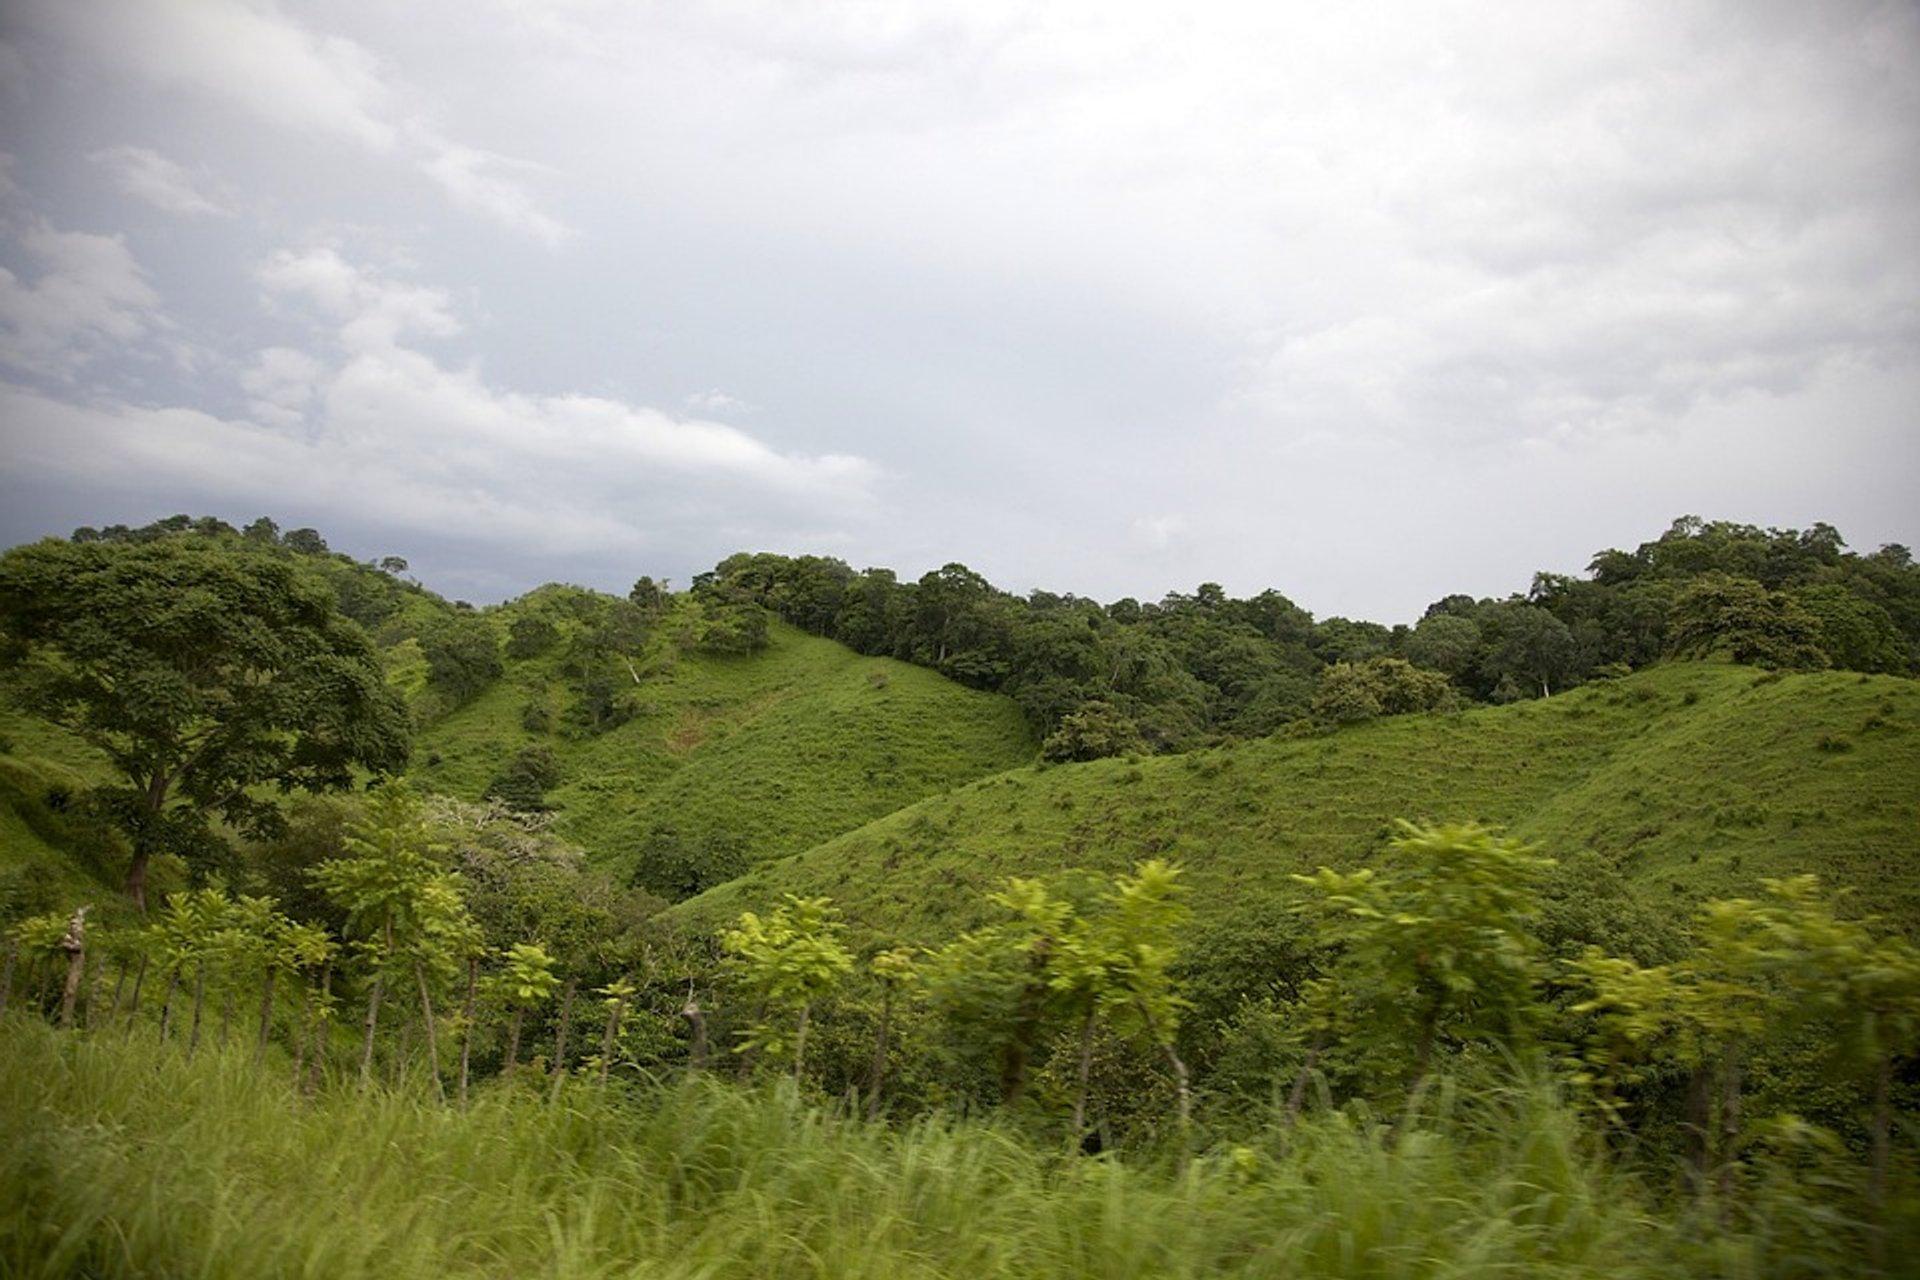 TransPanama Trail in Panama 2020 - Best Time